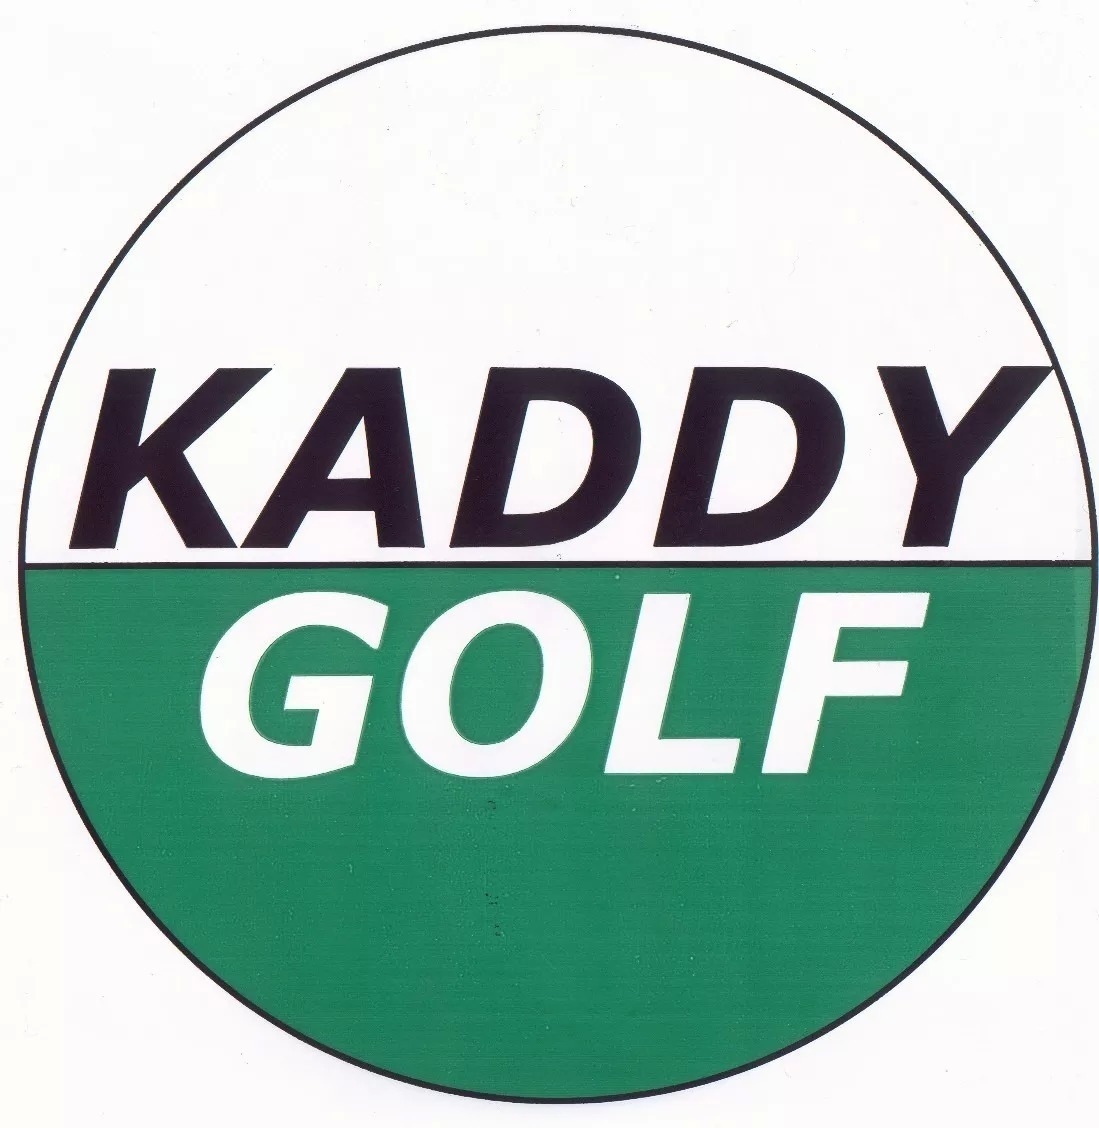 a5fe4553ffc0a Kaddygolf Orlimar Set Palos Golf Completo Grafito Nuevo Men ...